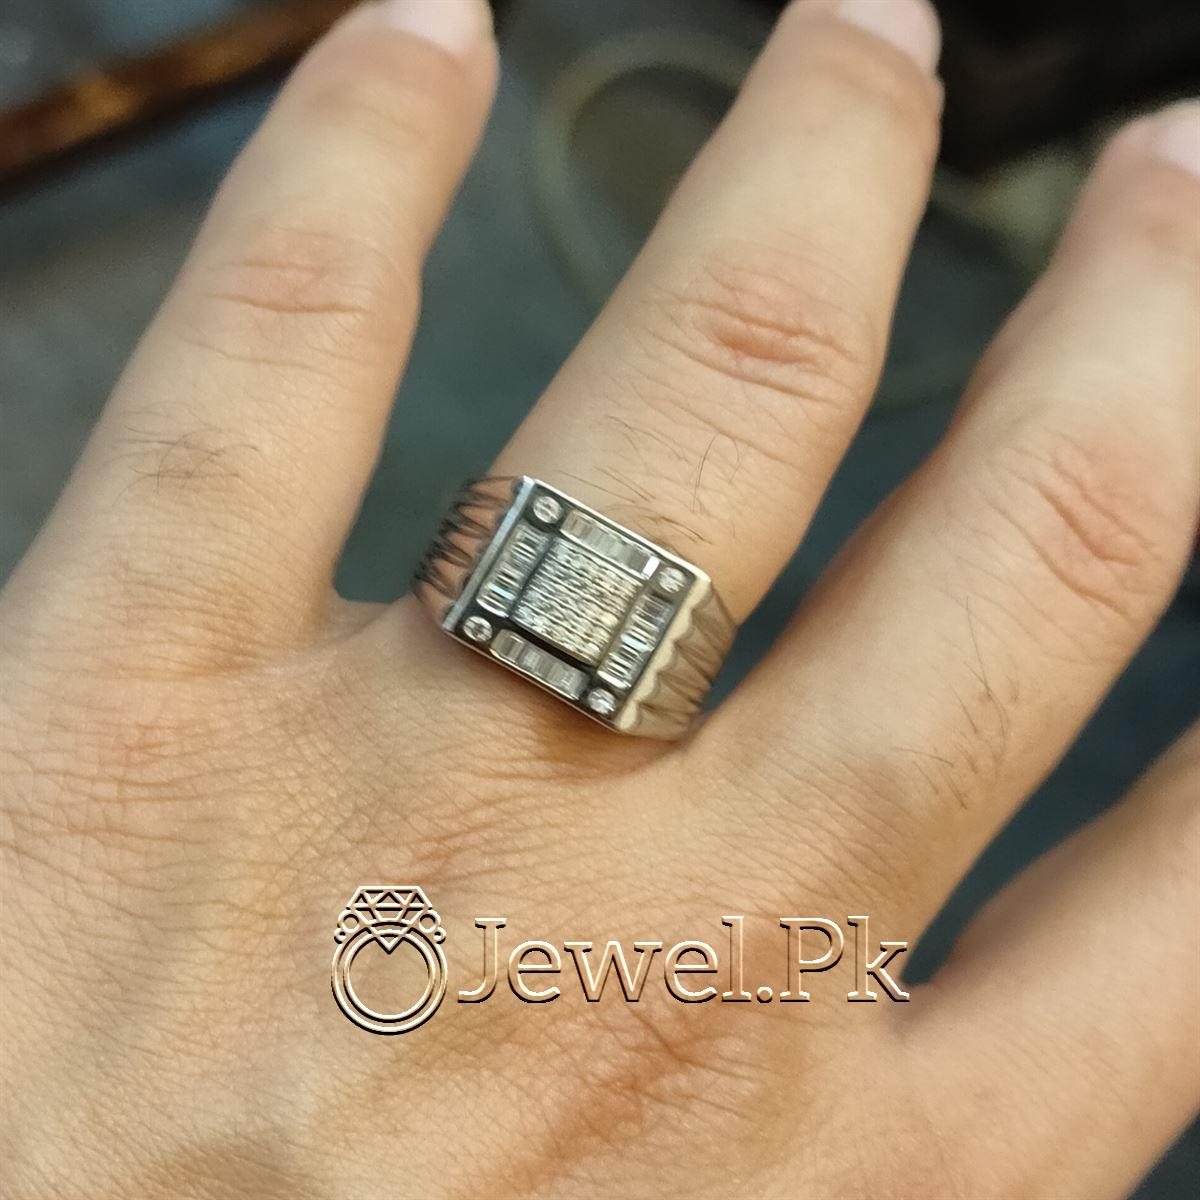 Luxury Italian Rings for men Very Beautiful Italian Zircon Rings for man 4 natural gemstones pakistan + 925 silver jewelry online